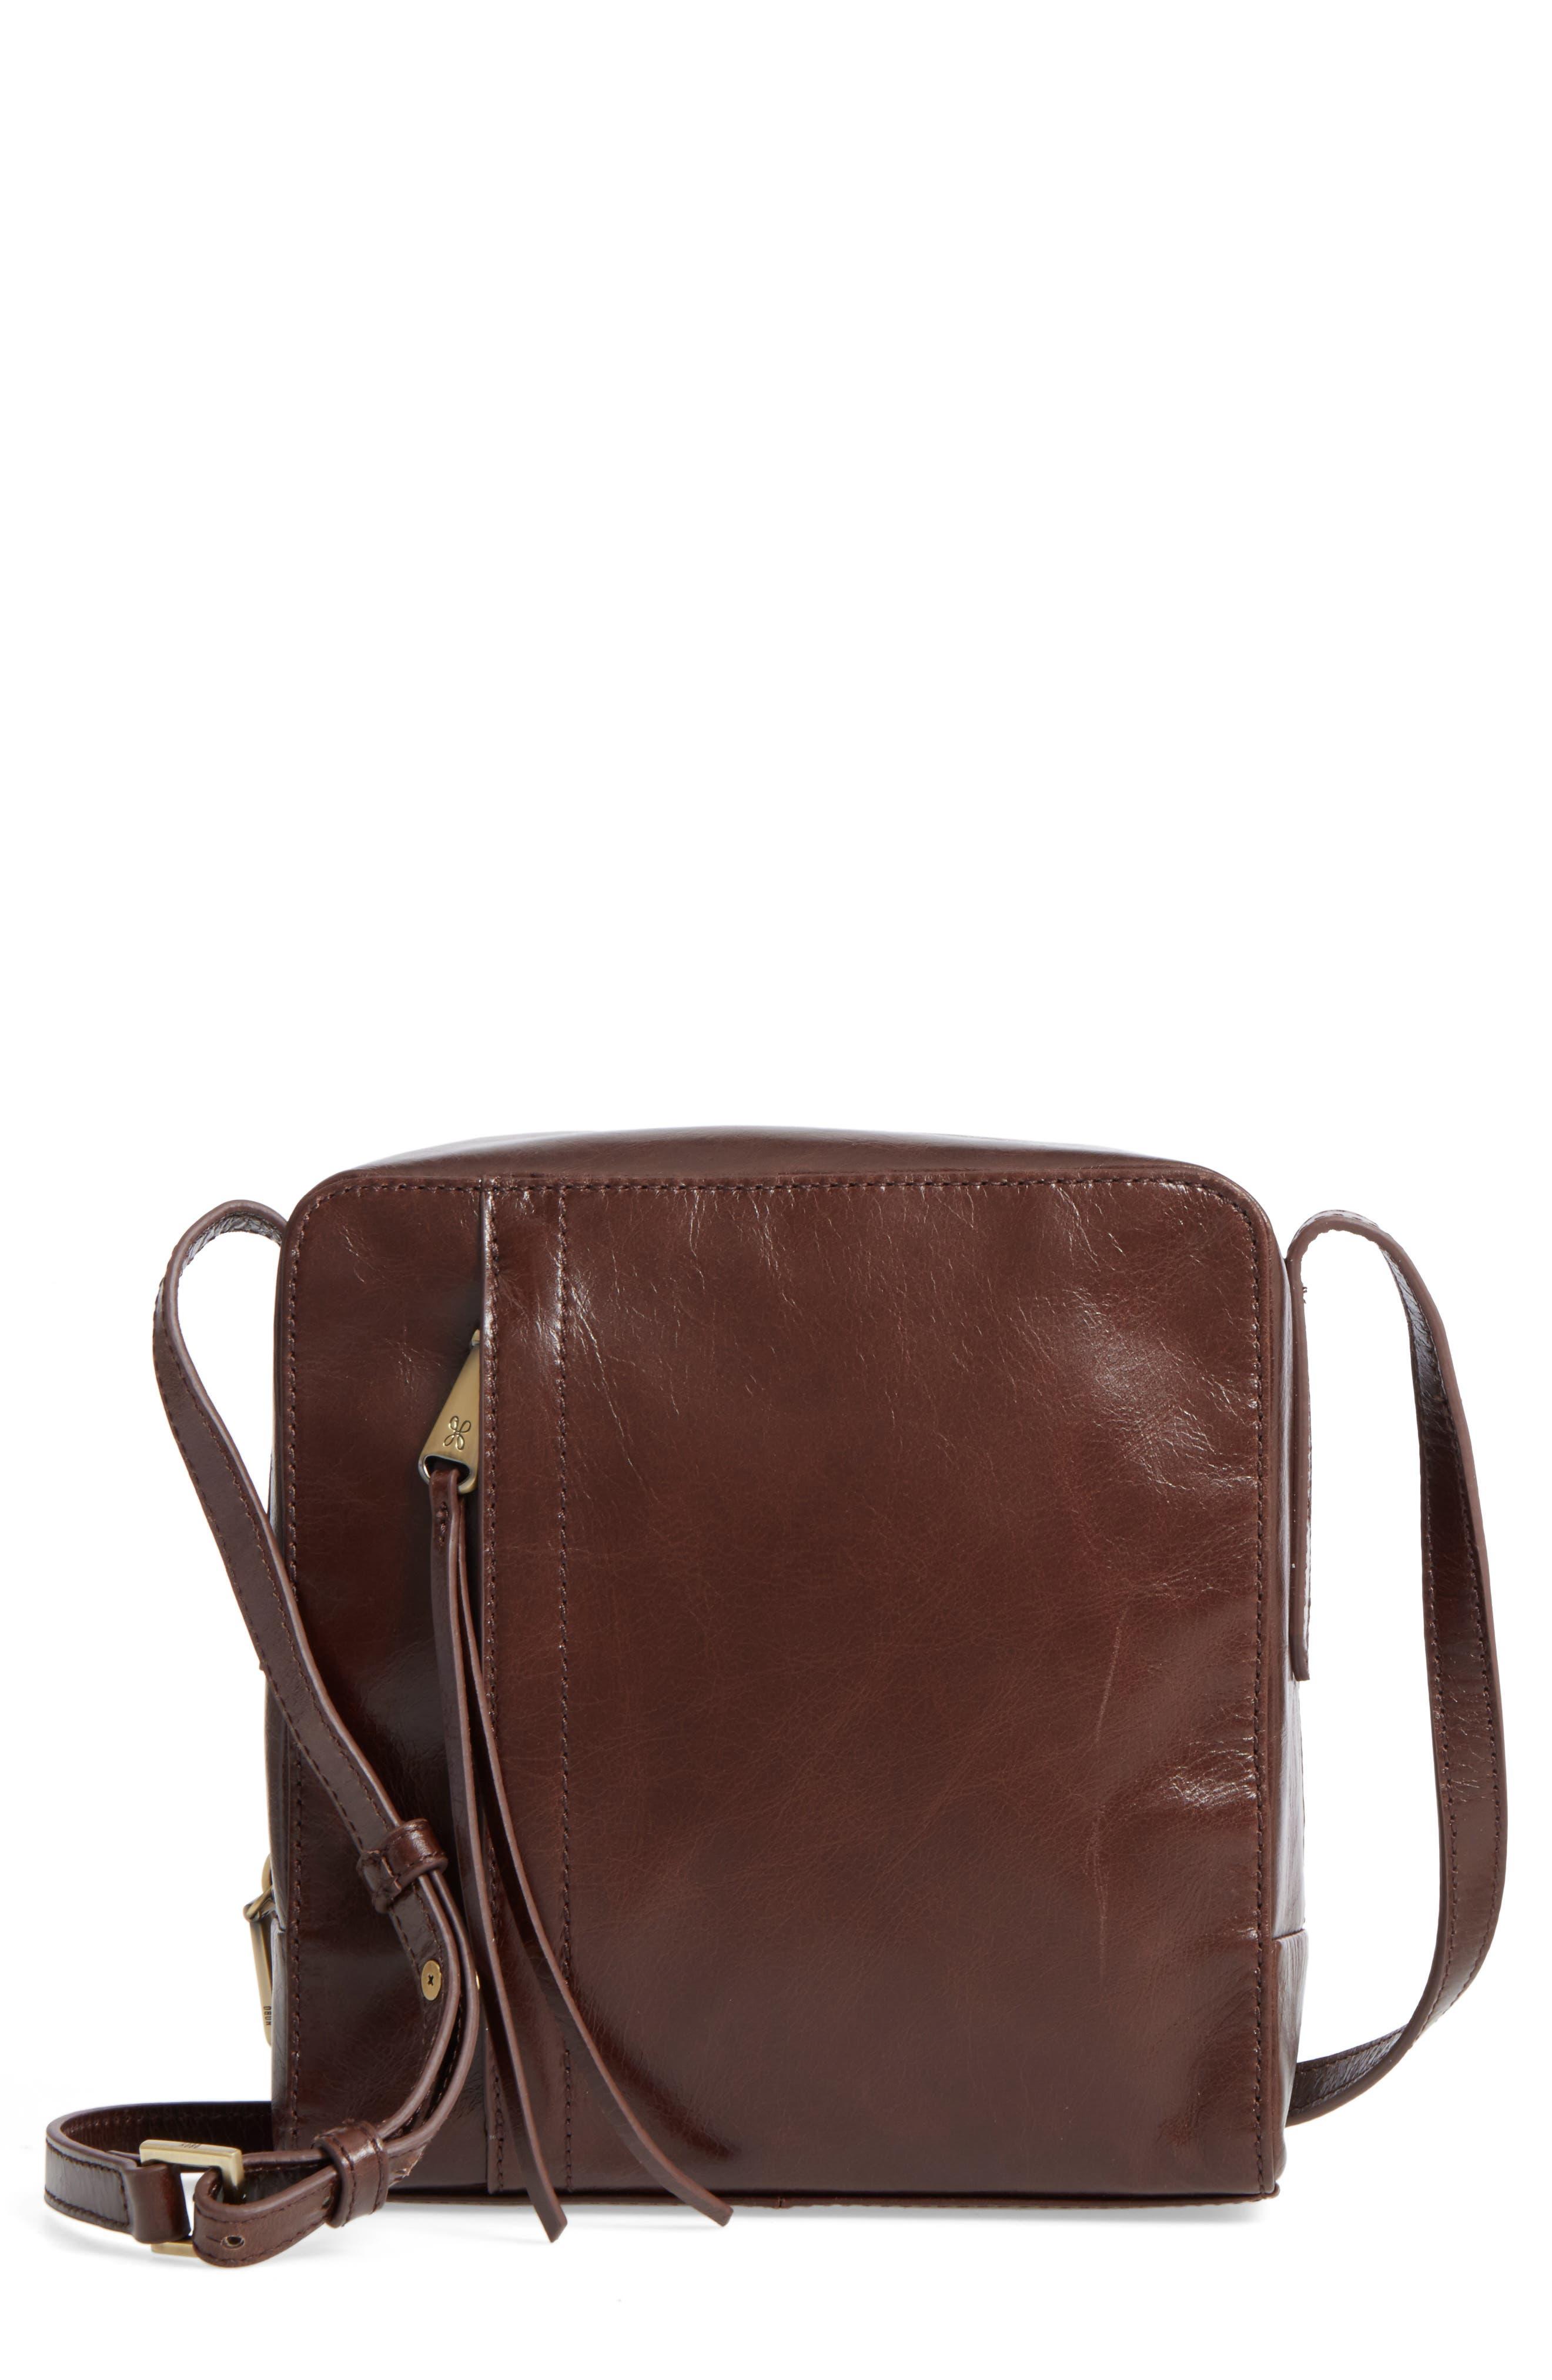 Lyric Leather Crossbody Bag,                             Main thumbnail 1, color,                             Espresso